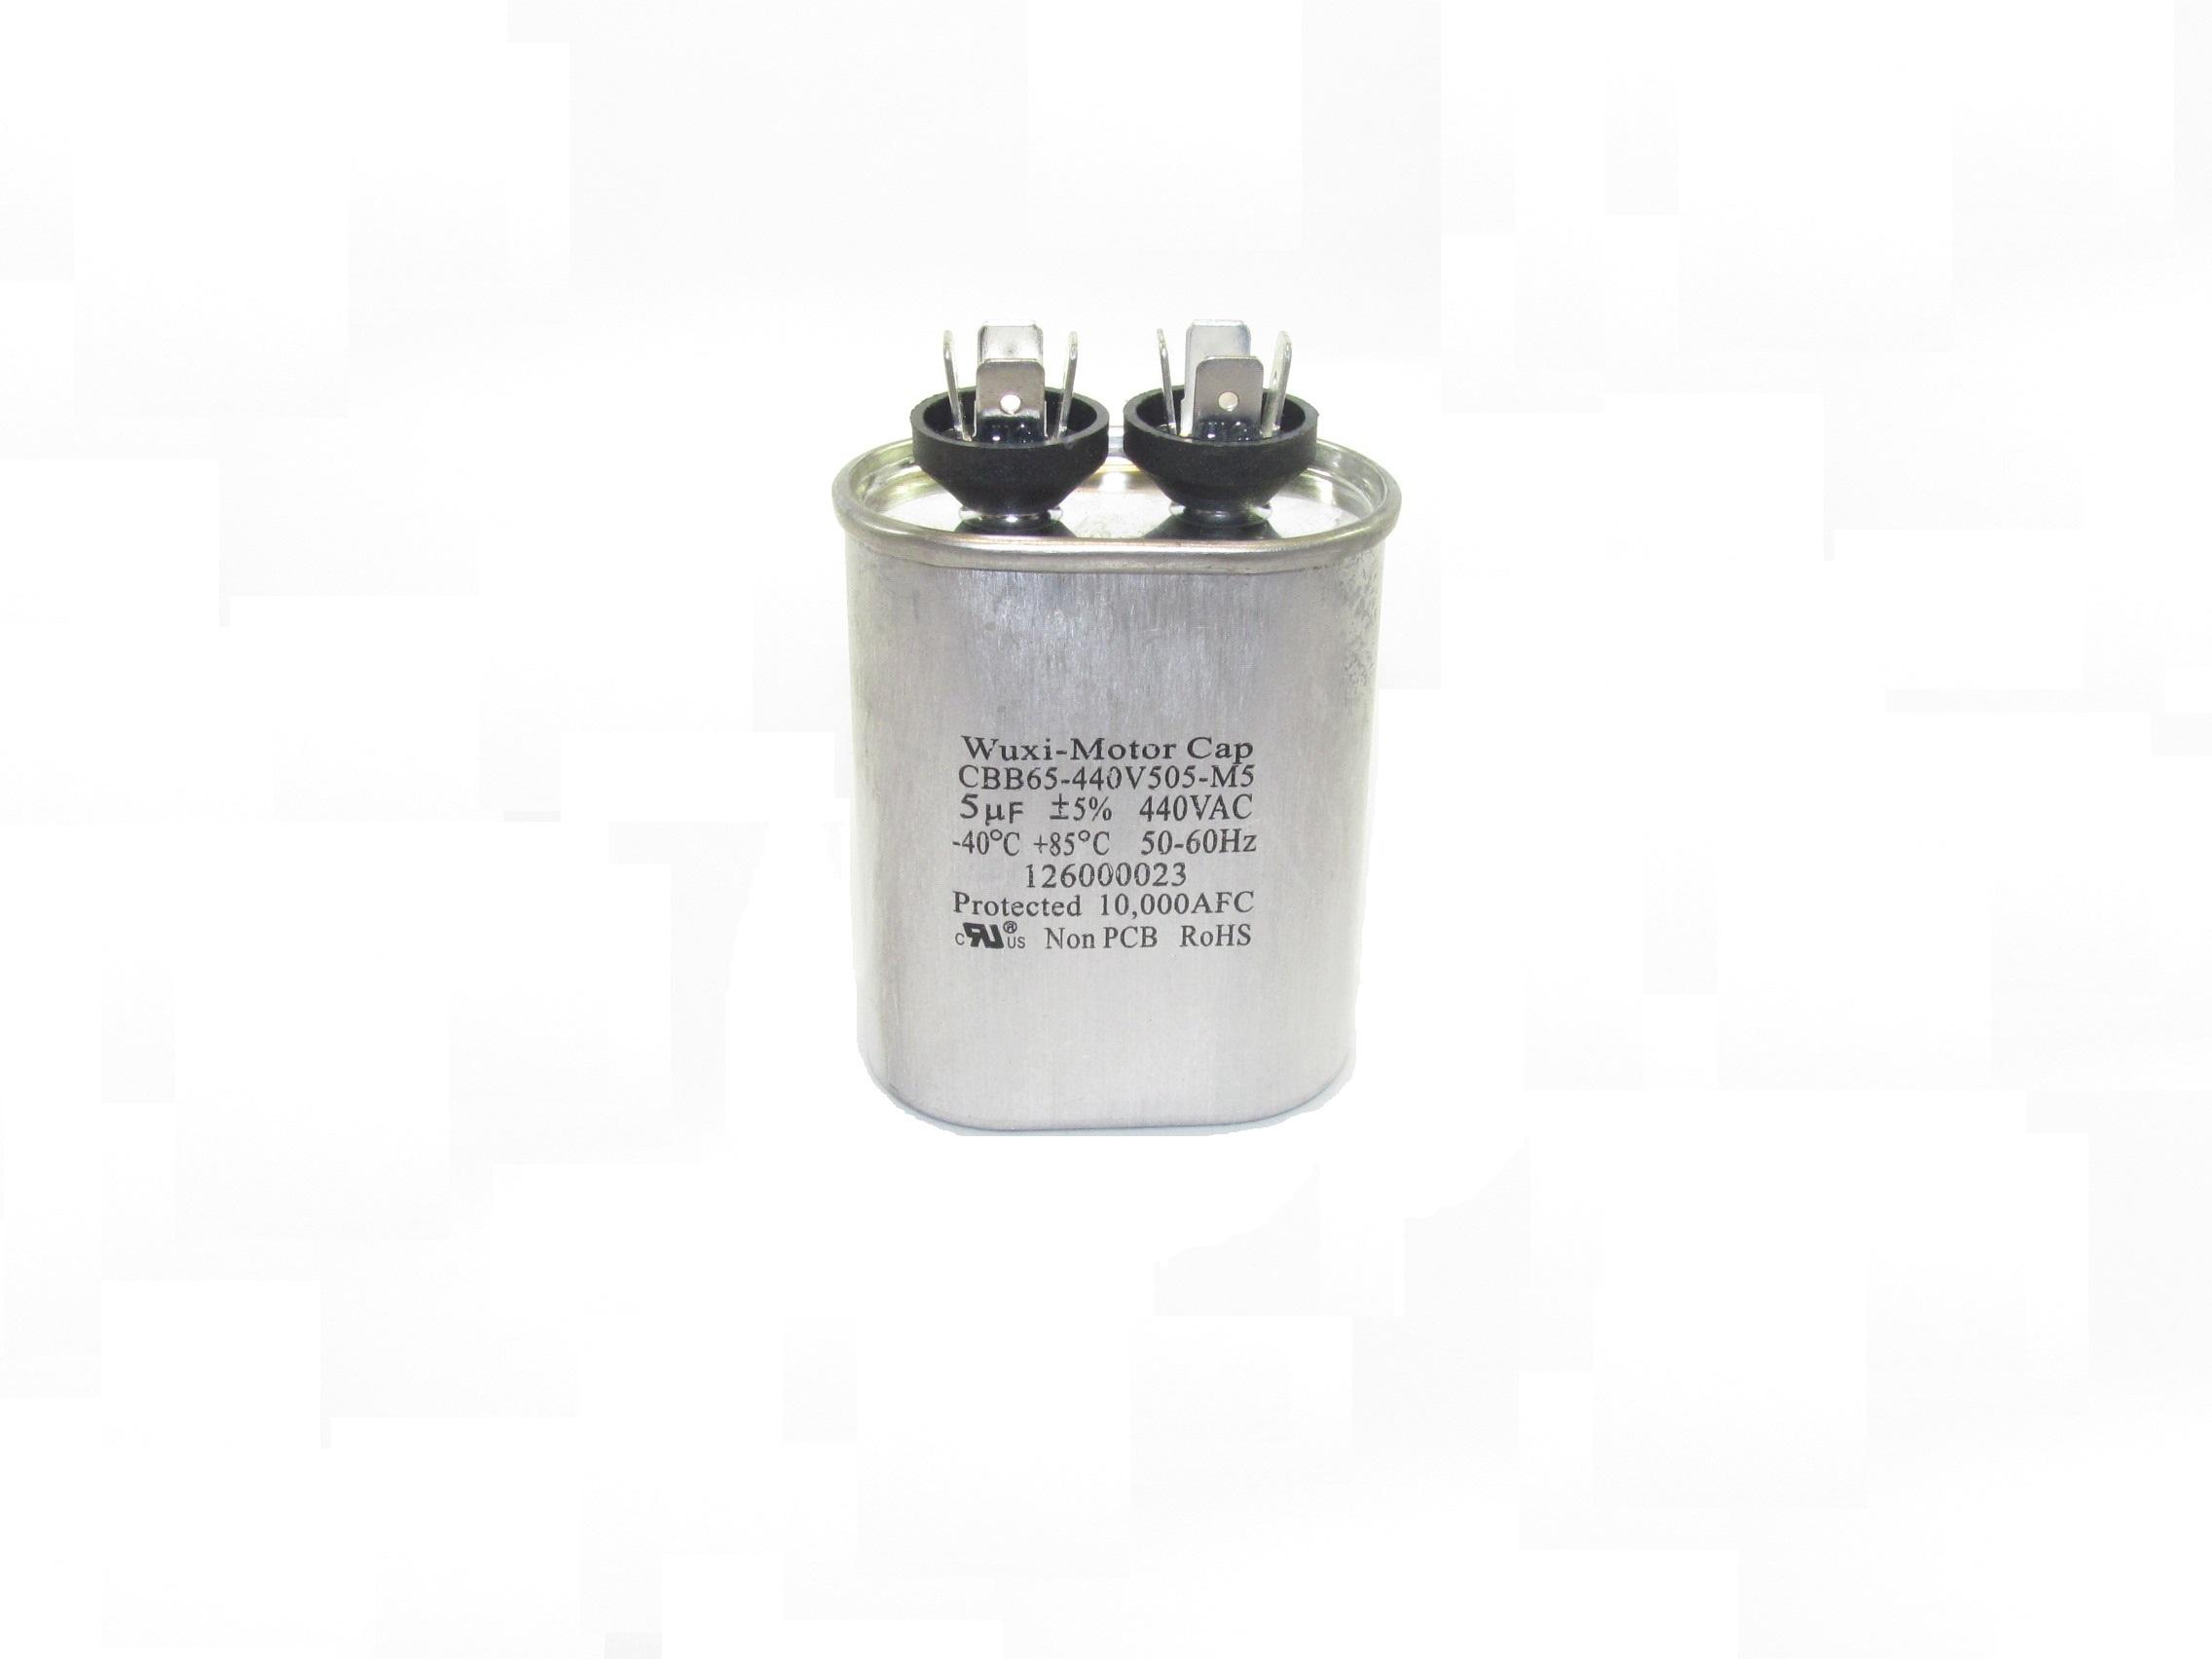 CBB65 Motor Run Capacitors (Oval-Shaped, Single Capacitance Value)